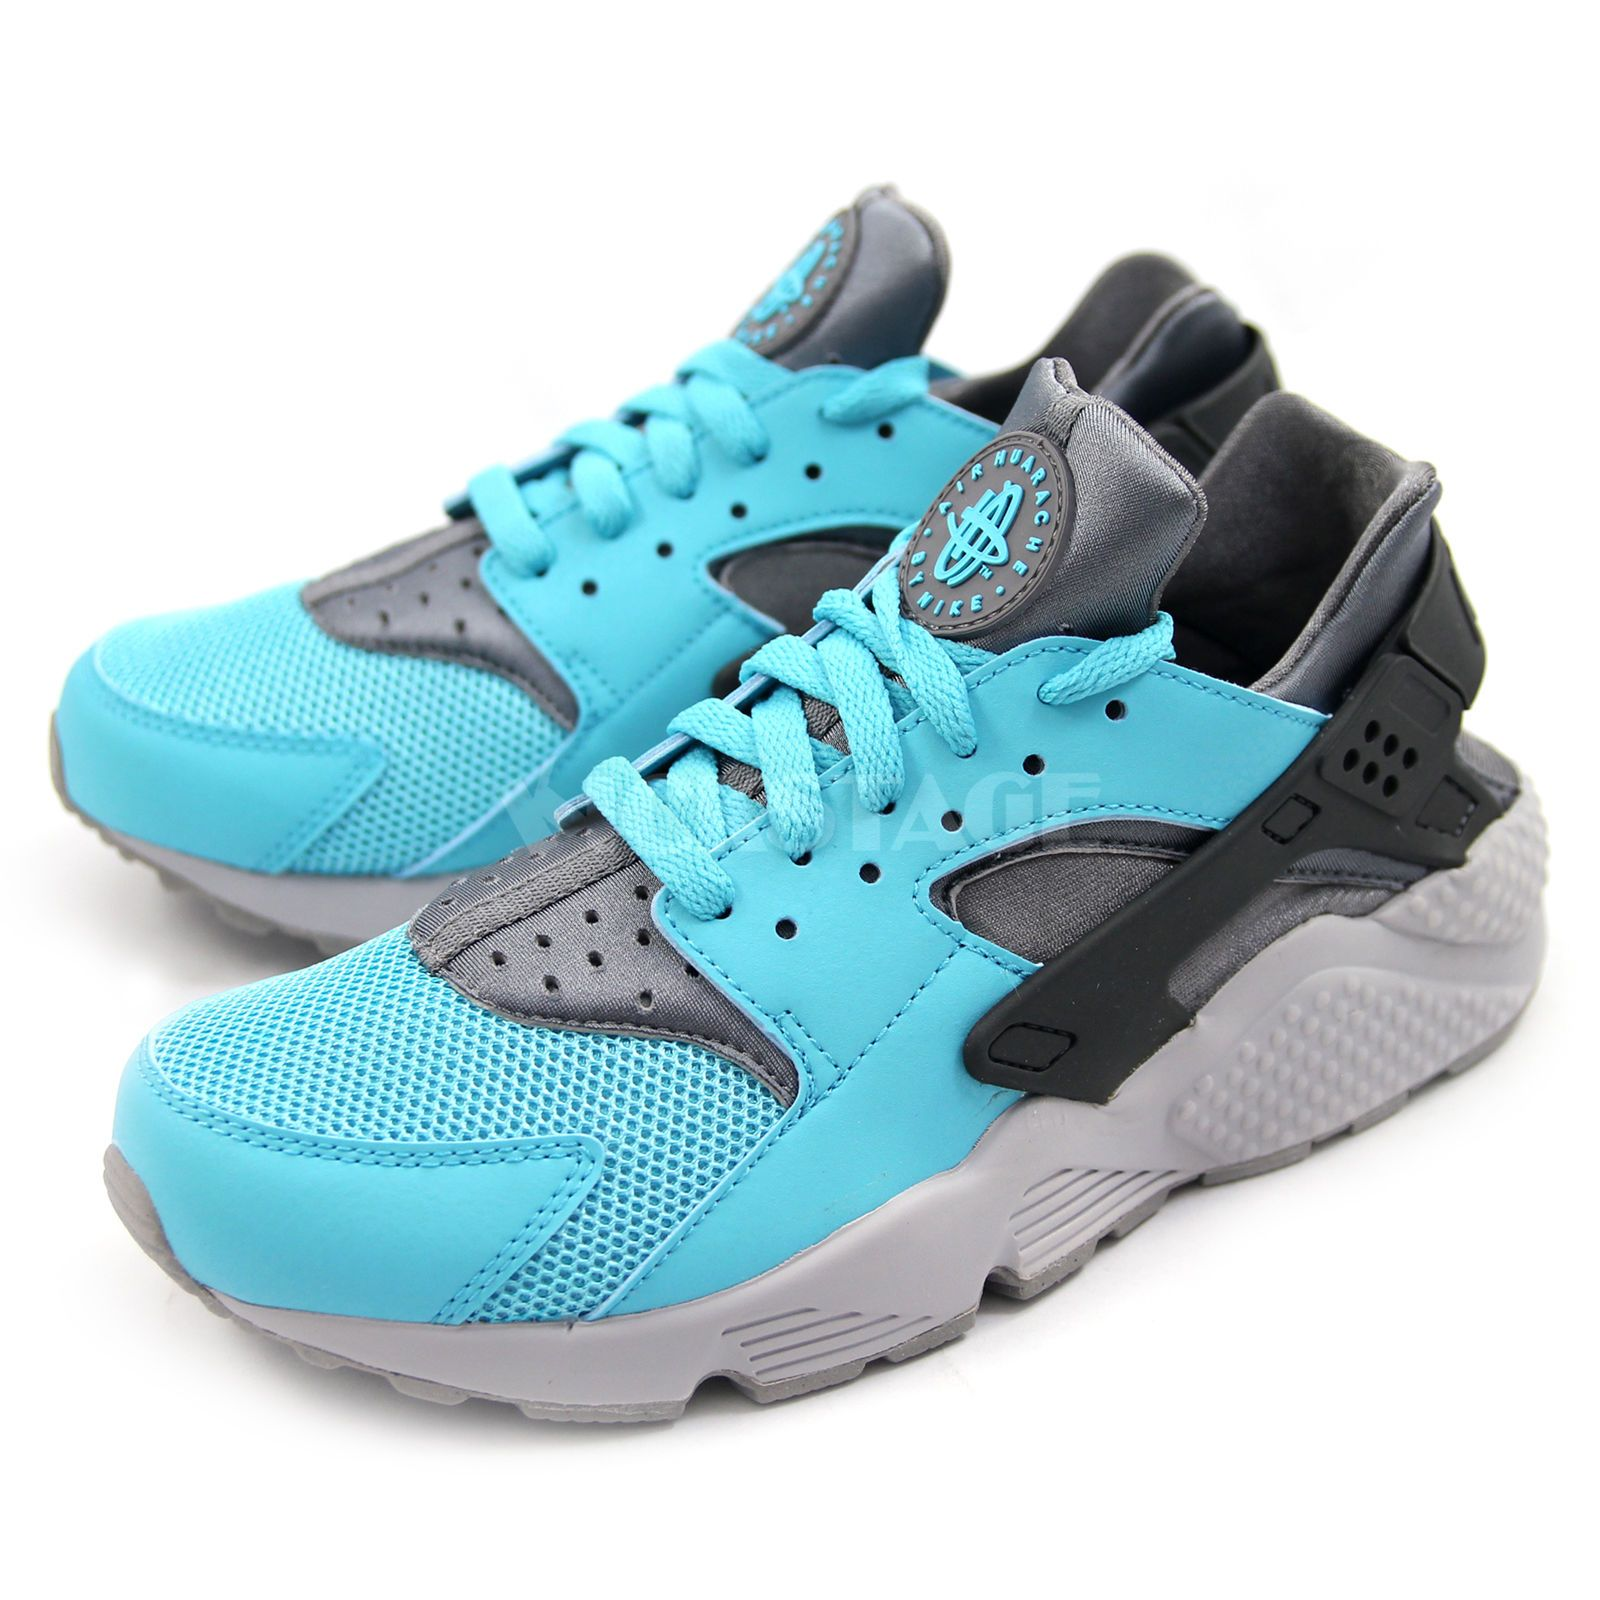 Nike Store 19 En Huarache Pinterest Nike Air Huarache Huarache En Y Gris 8491b2